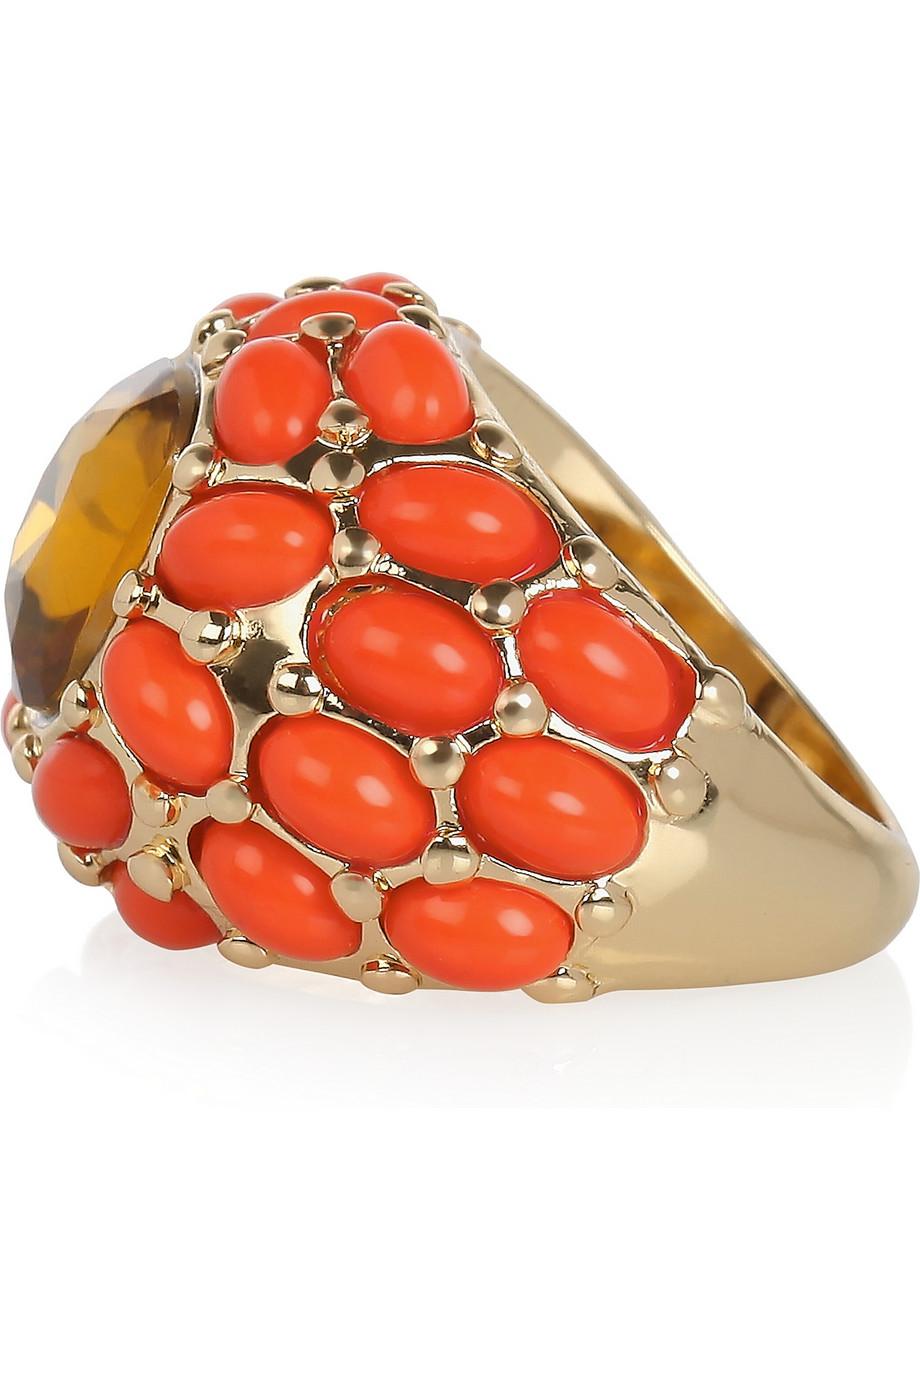 Kenneth Jay Lane Plated Cubic Zirconia Ring in Pastel Orange (Orange)